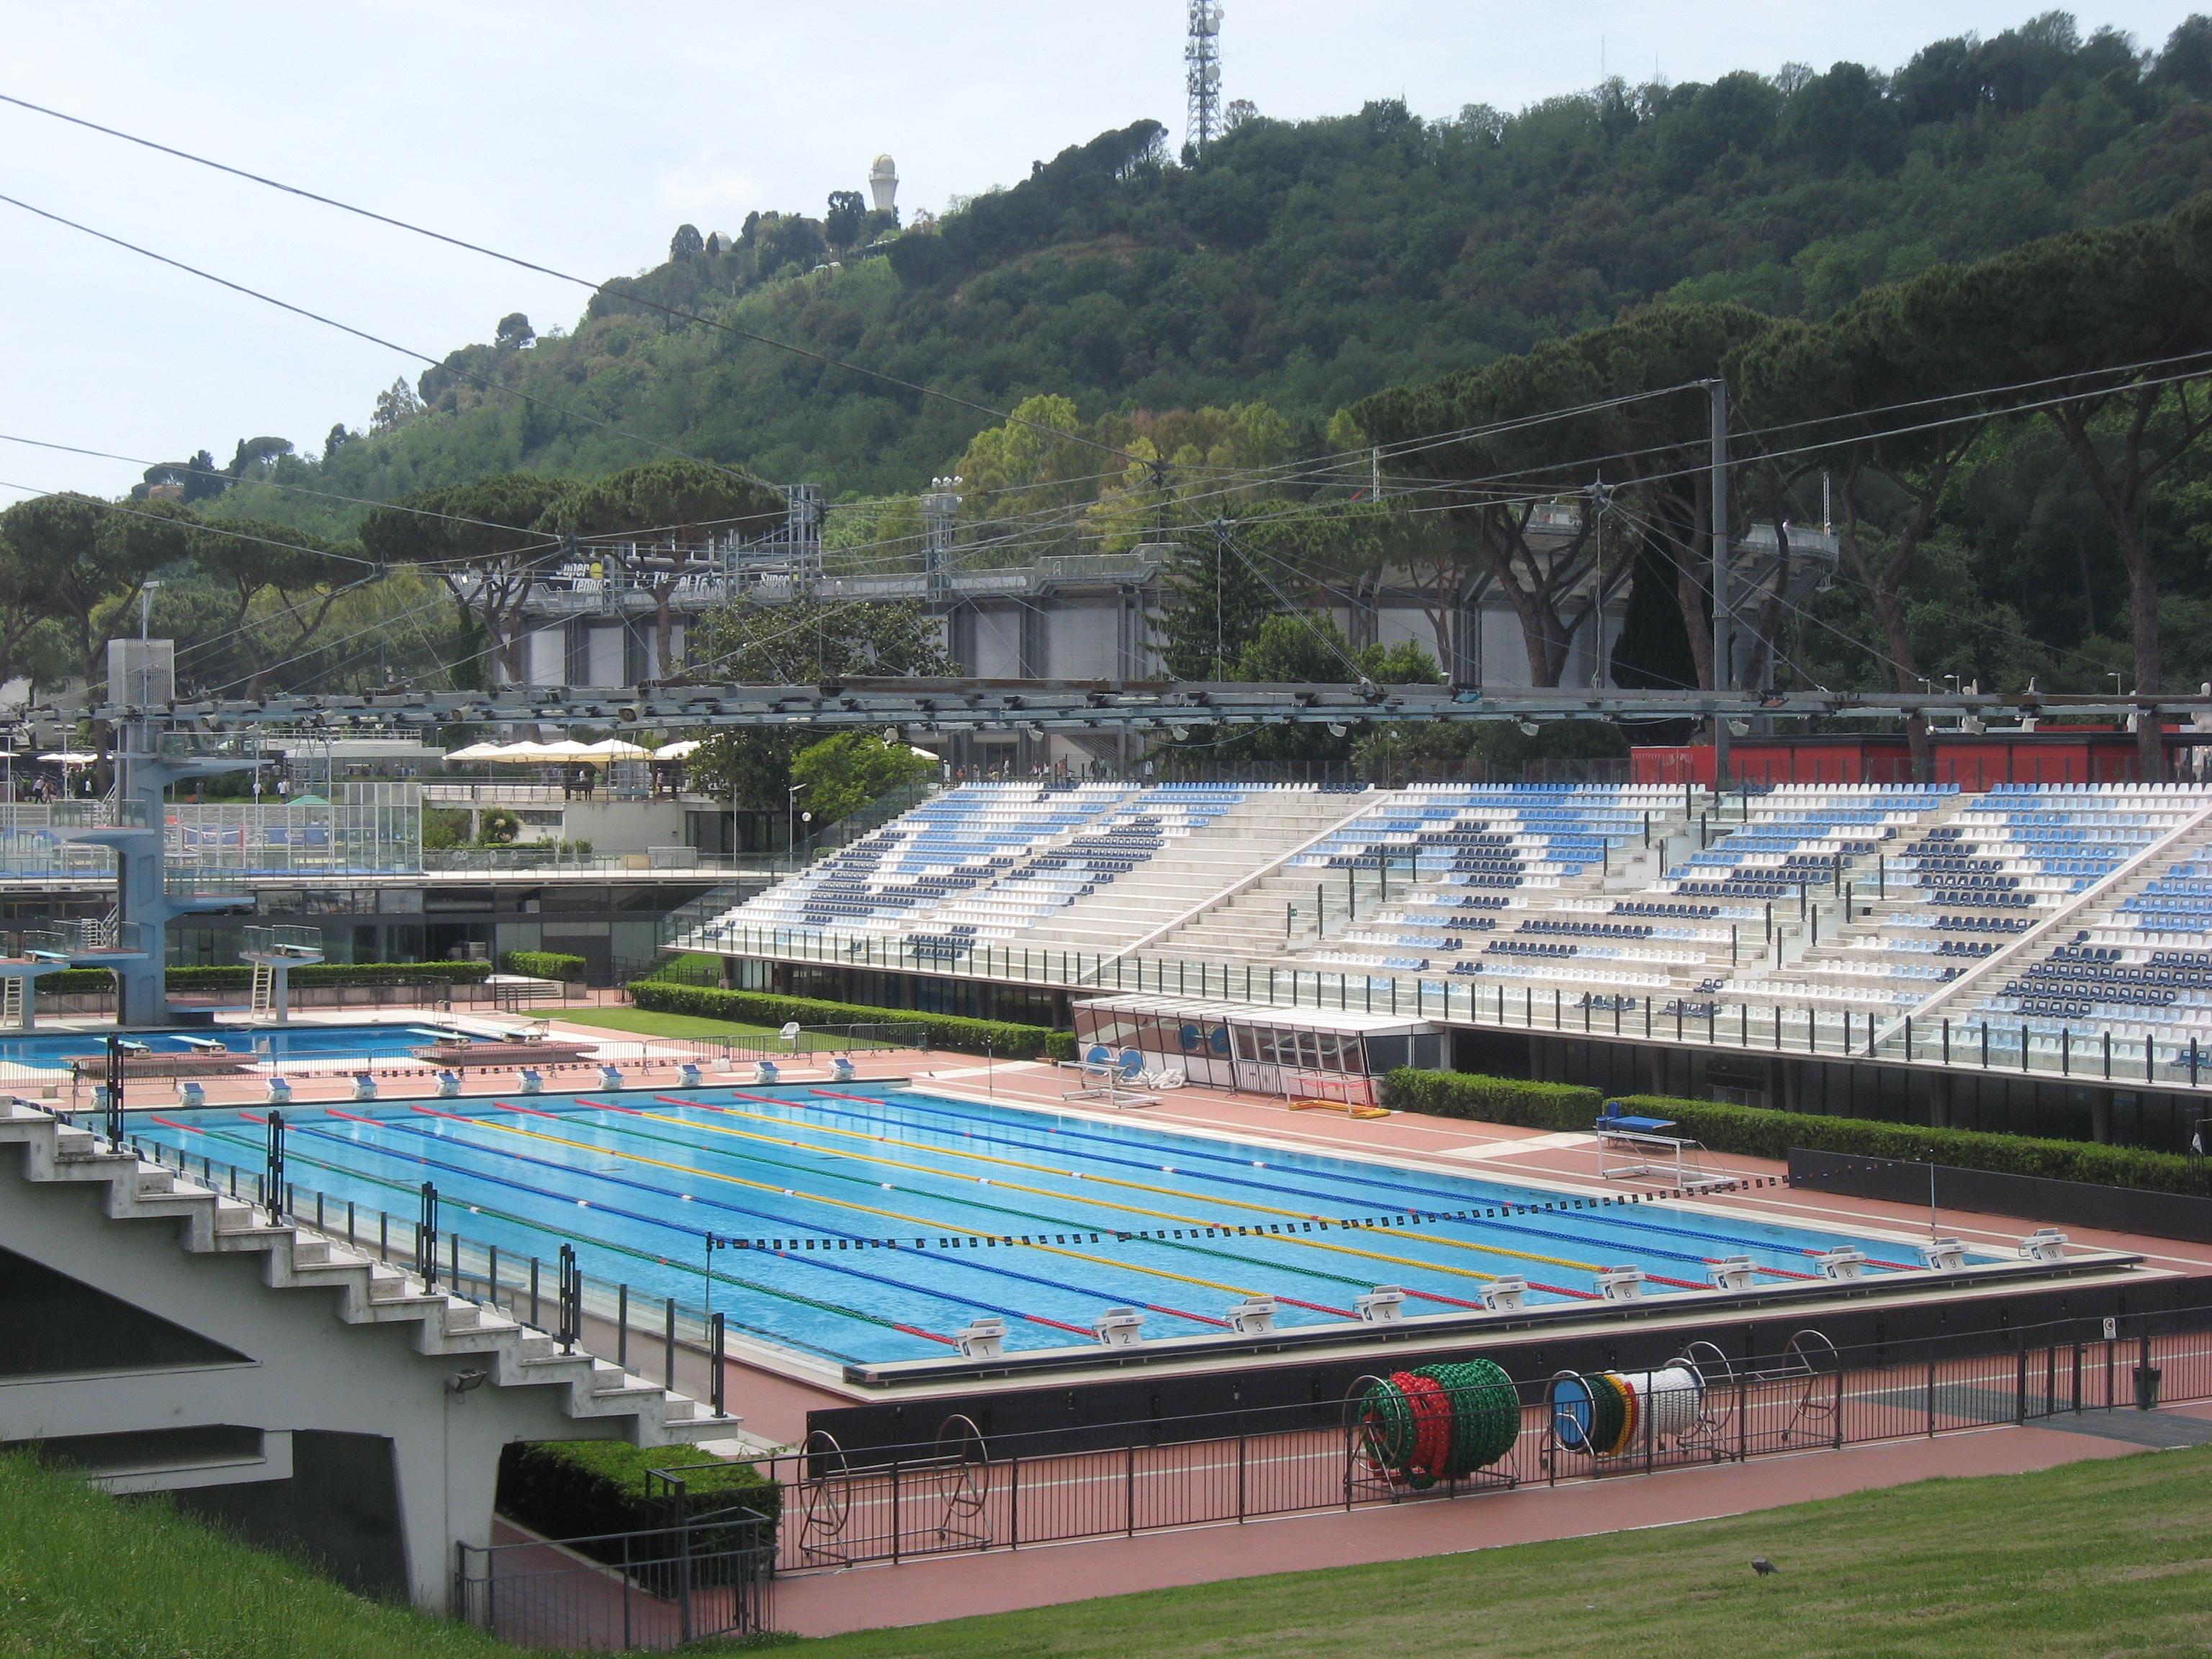 Aquatics Centers / Swimming Arenas - Página 5 - SkyscraperCity